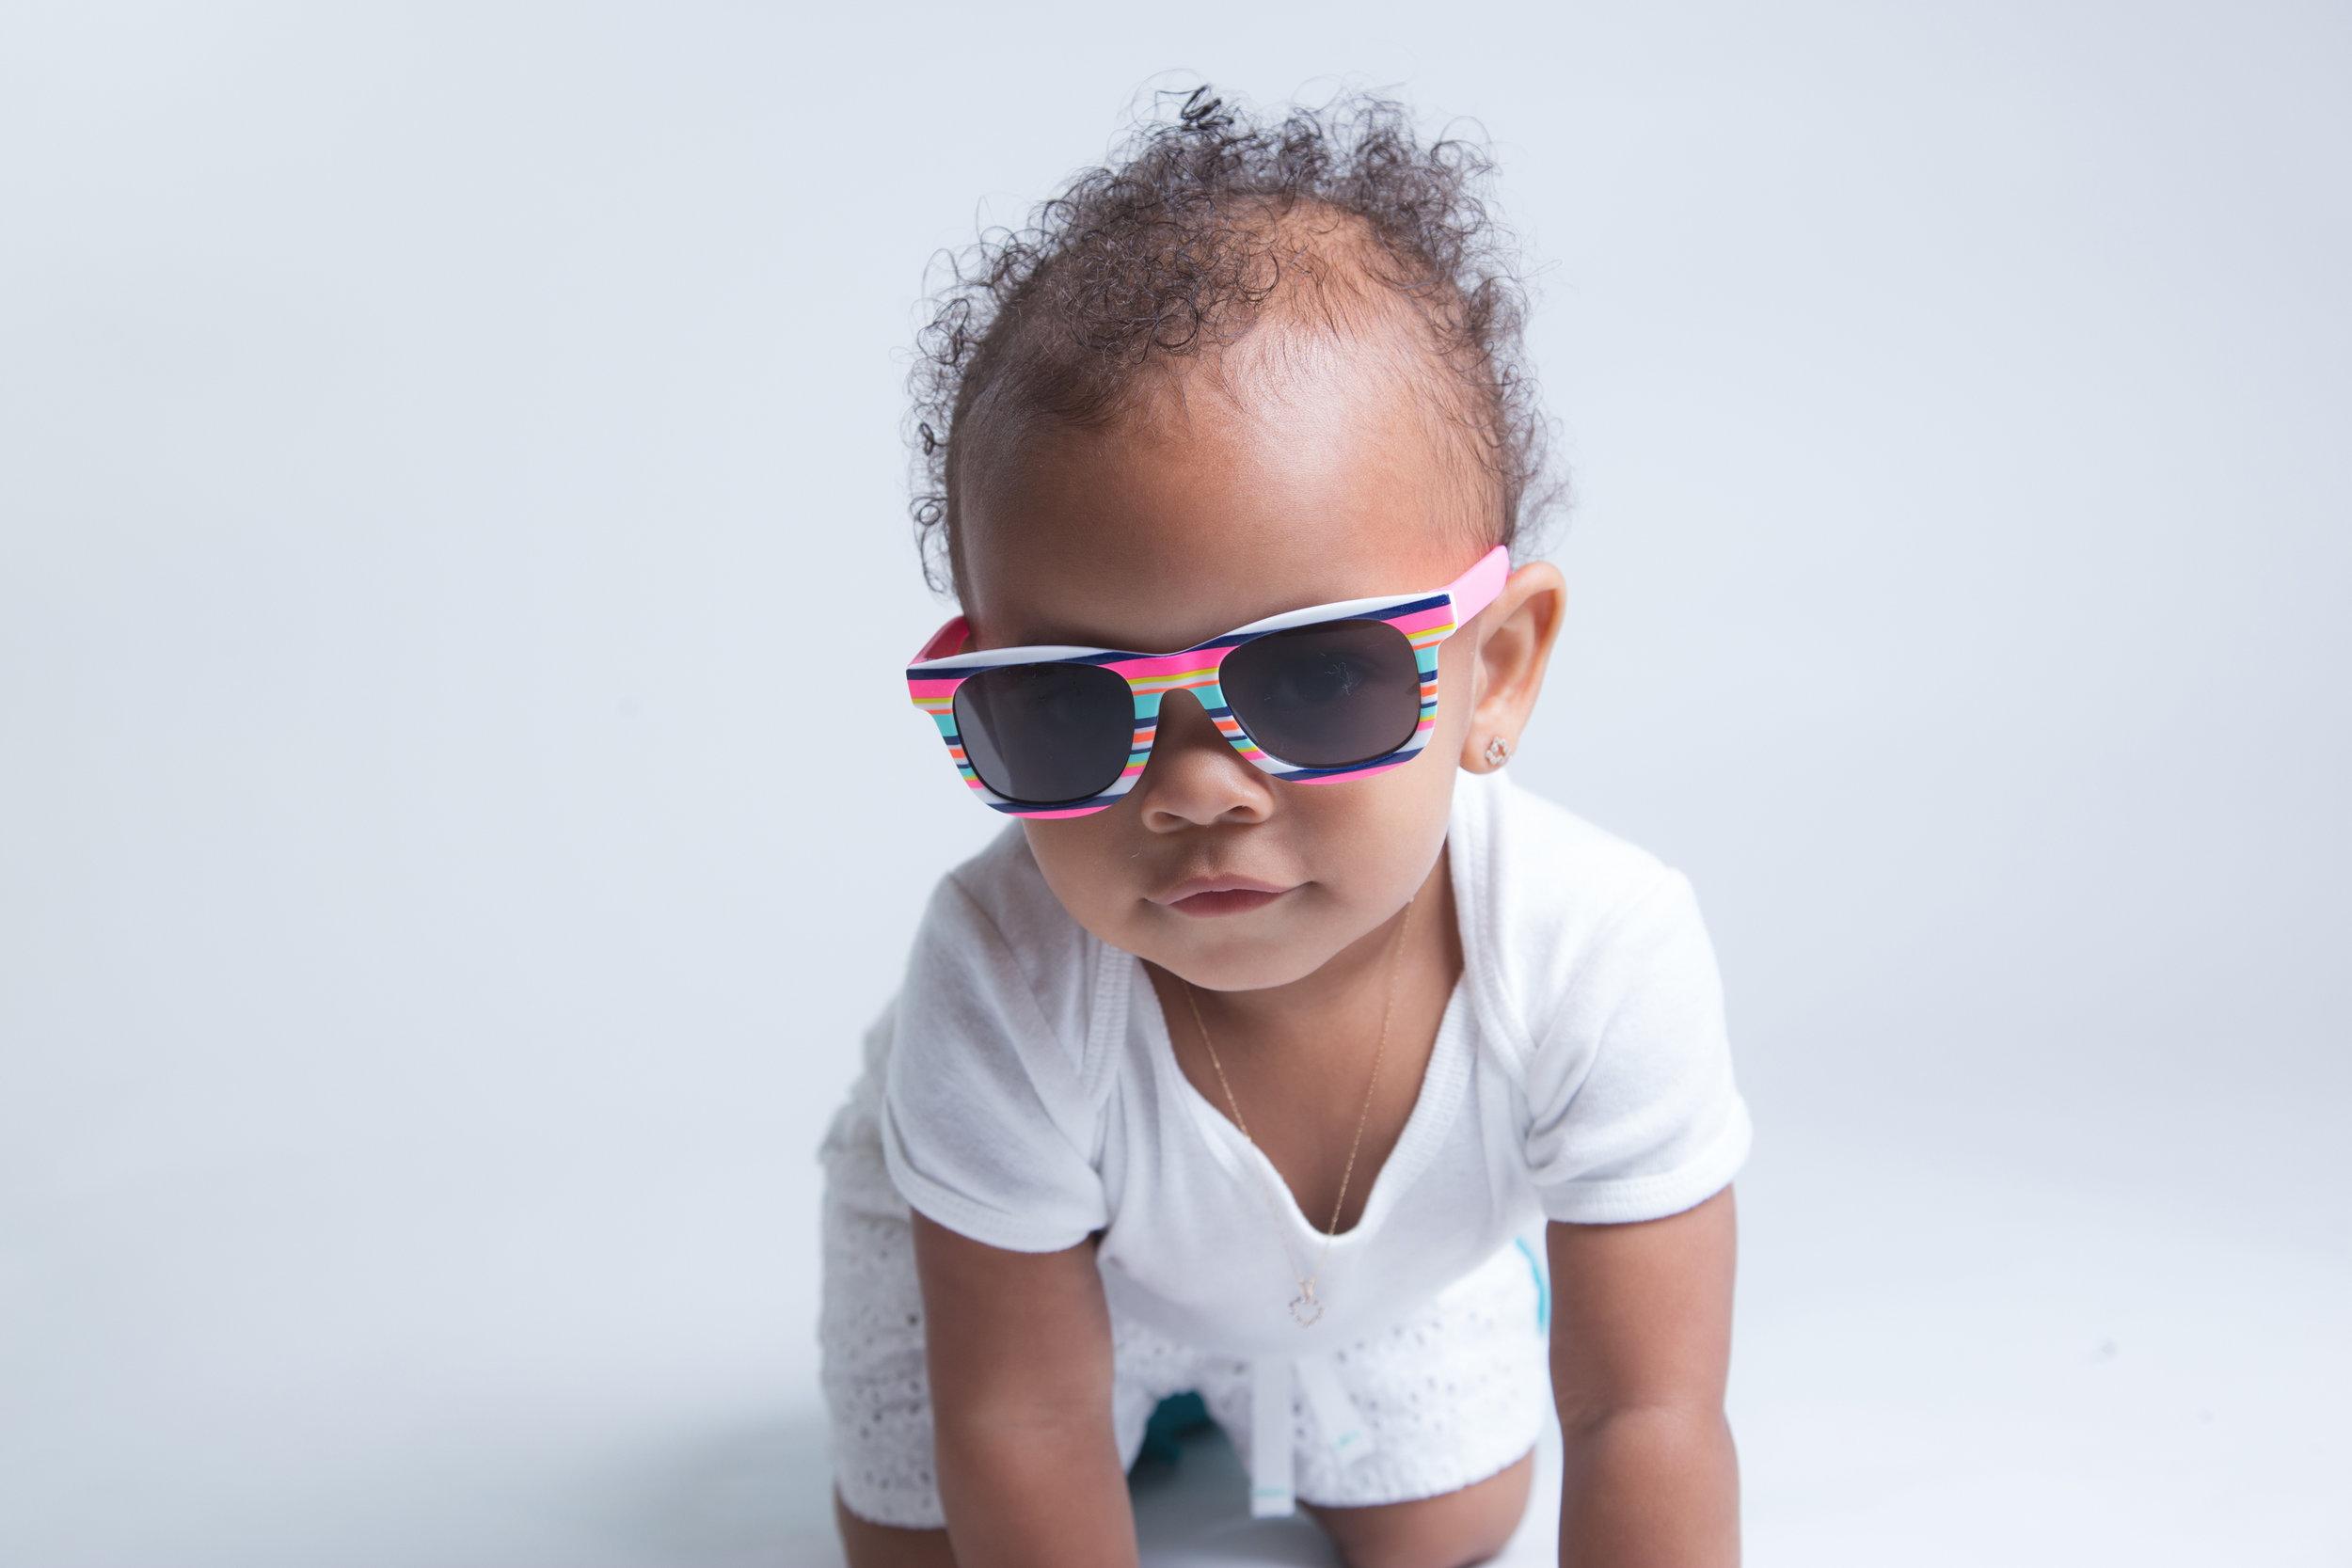 baby-photo-shoot-chamber-photography-antoine-hart-4.jpg